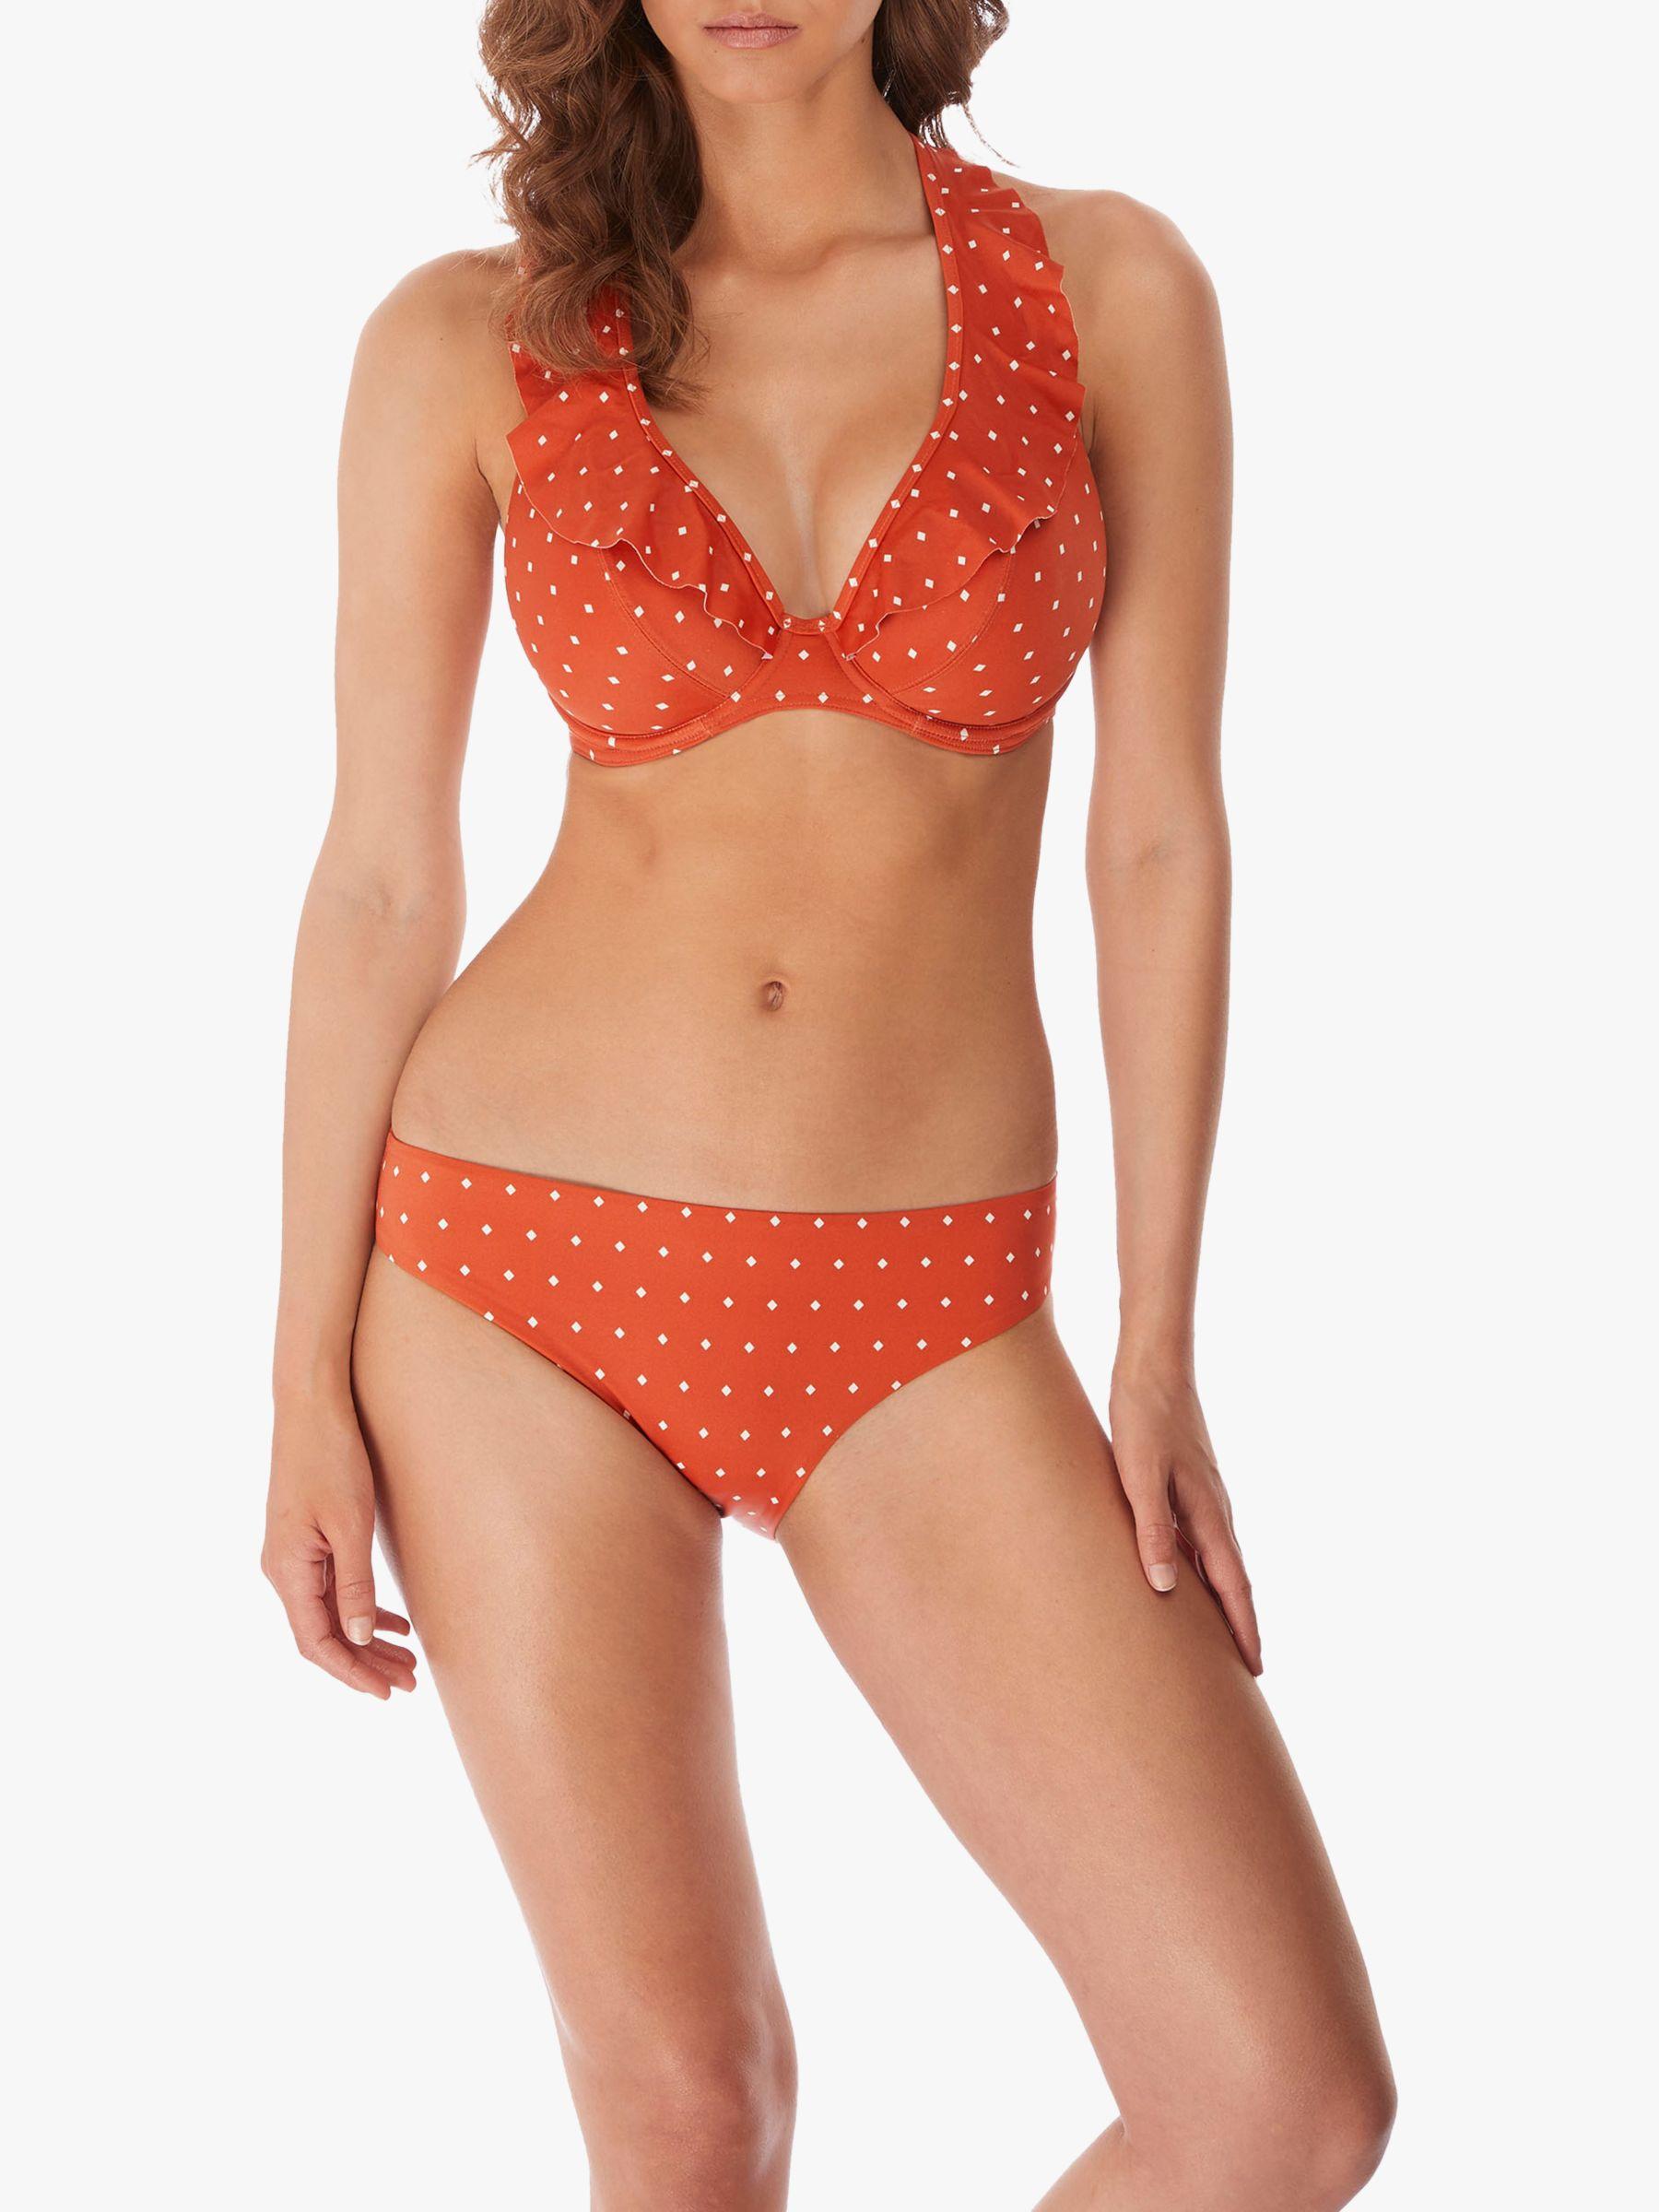 Freya Freya Jewel Cove Bikini Top, Amber